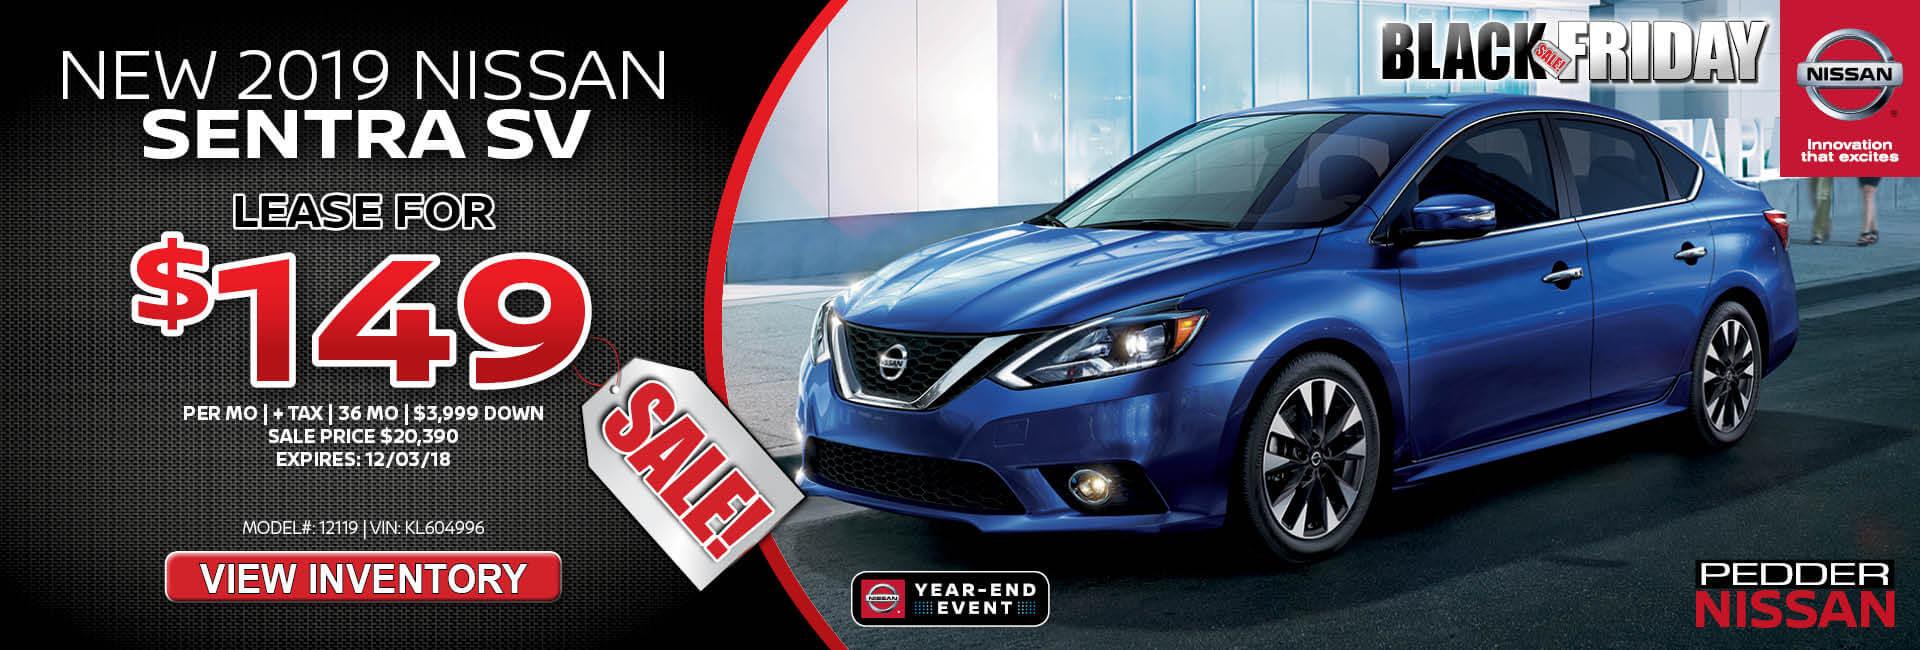 Nissan Sentra $149 Lease